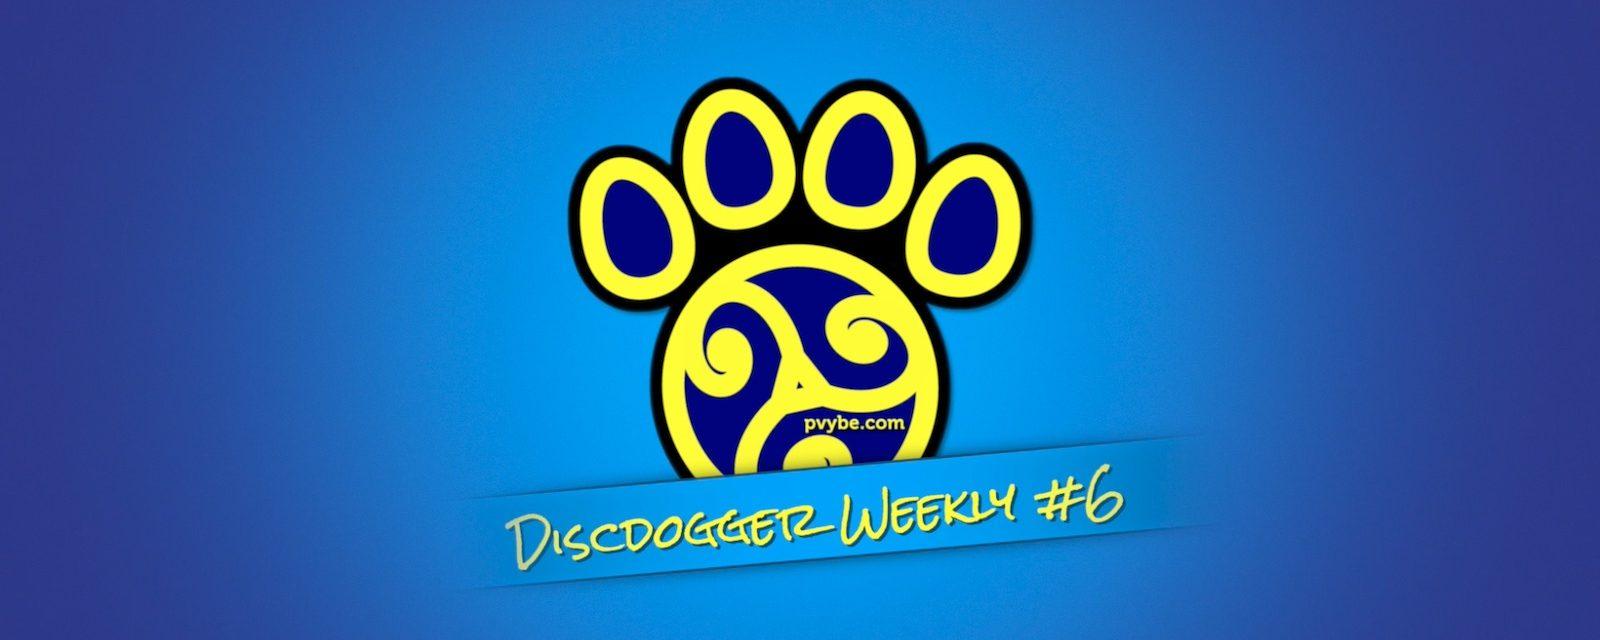 DiscDogger Weekly #6